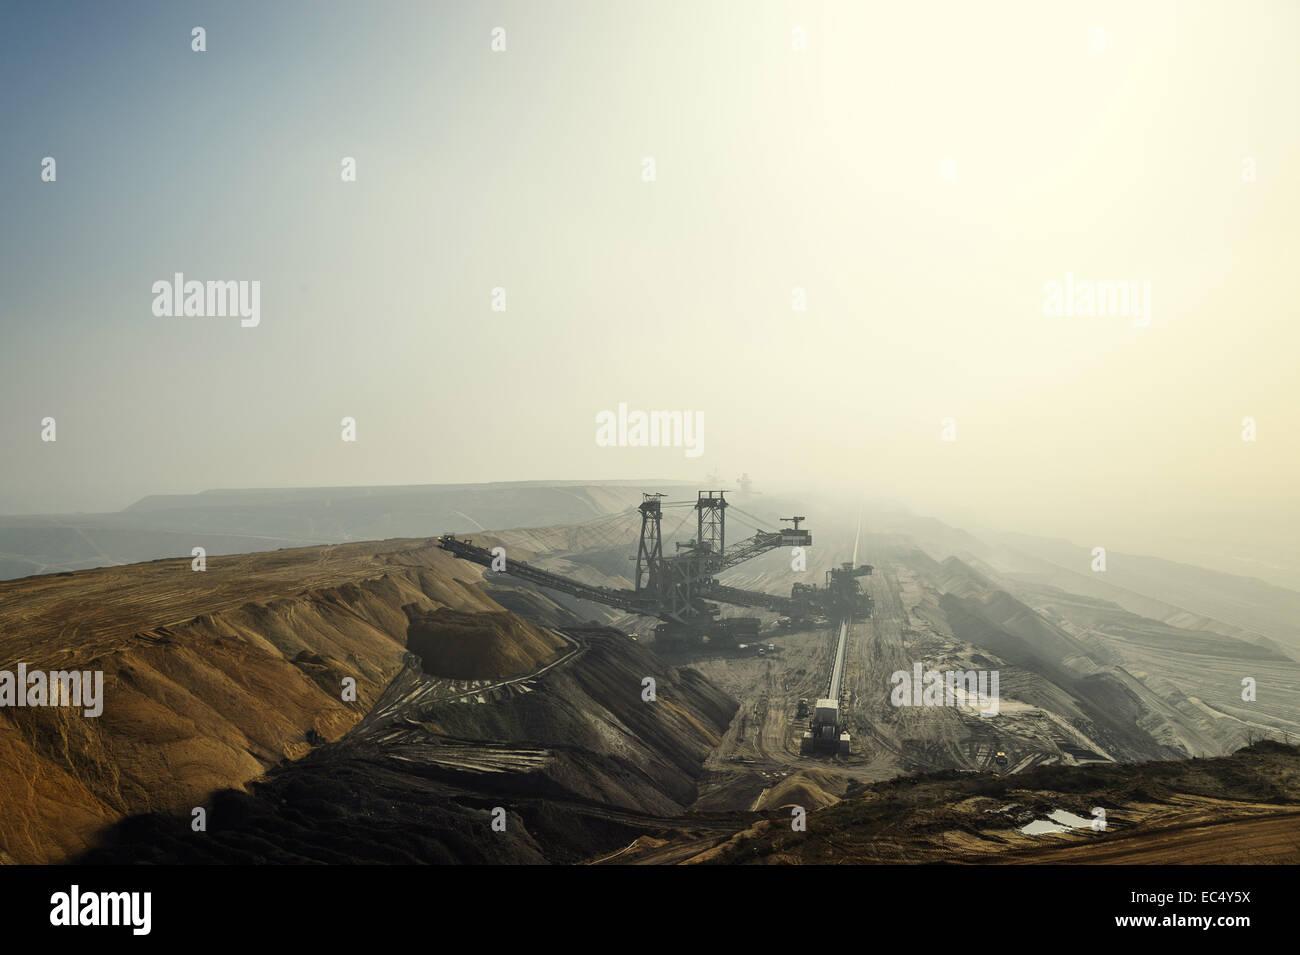 Longitudinal view of the Garzweiler mine in fog and sunshine - Stock Image